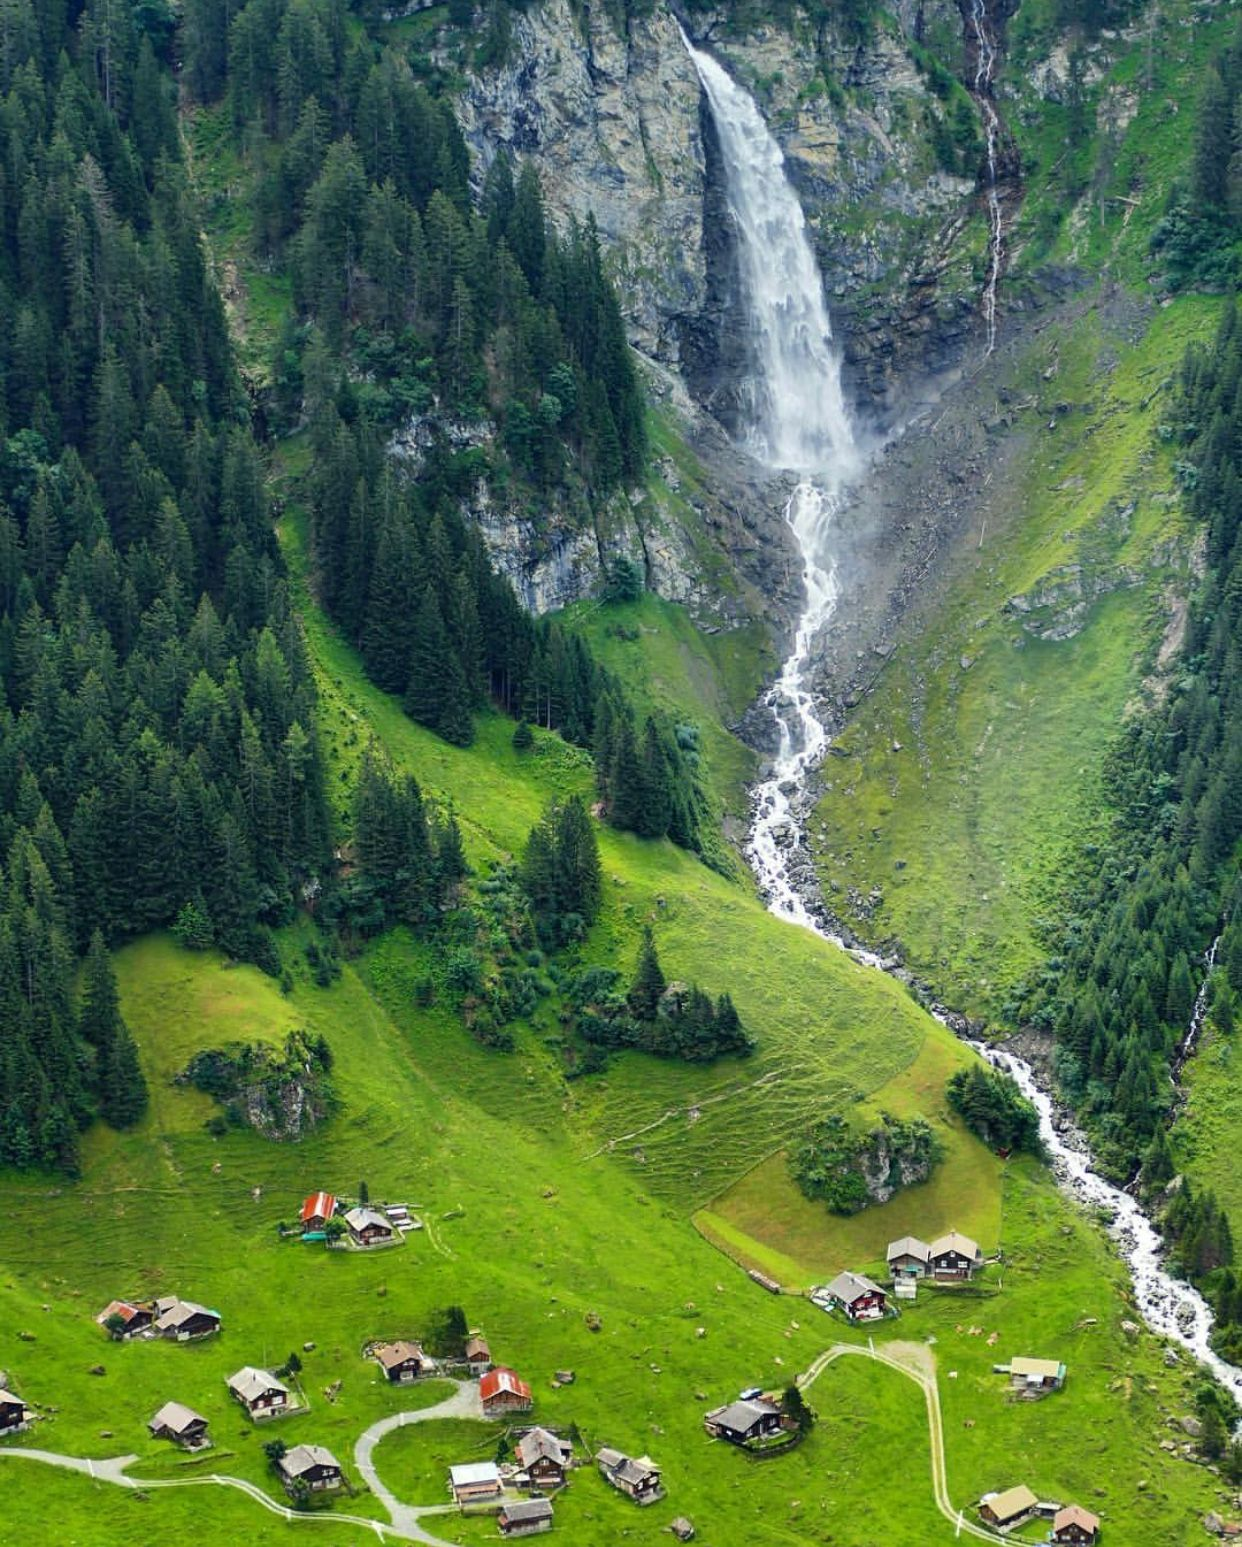 Switzerland Beautiful Places: Paisajes, Paisaje De Fantasía